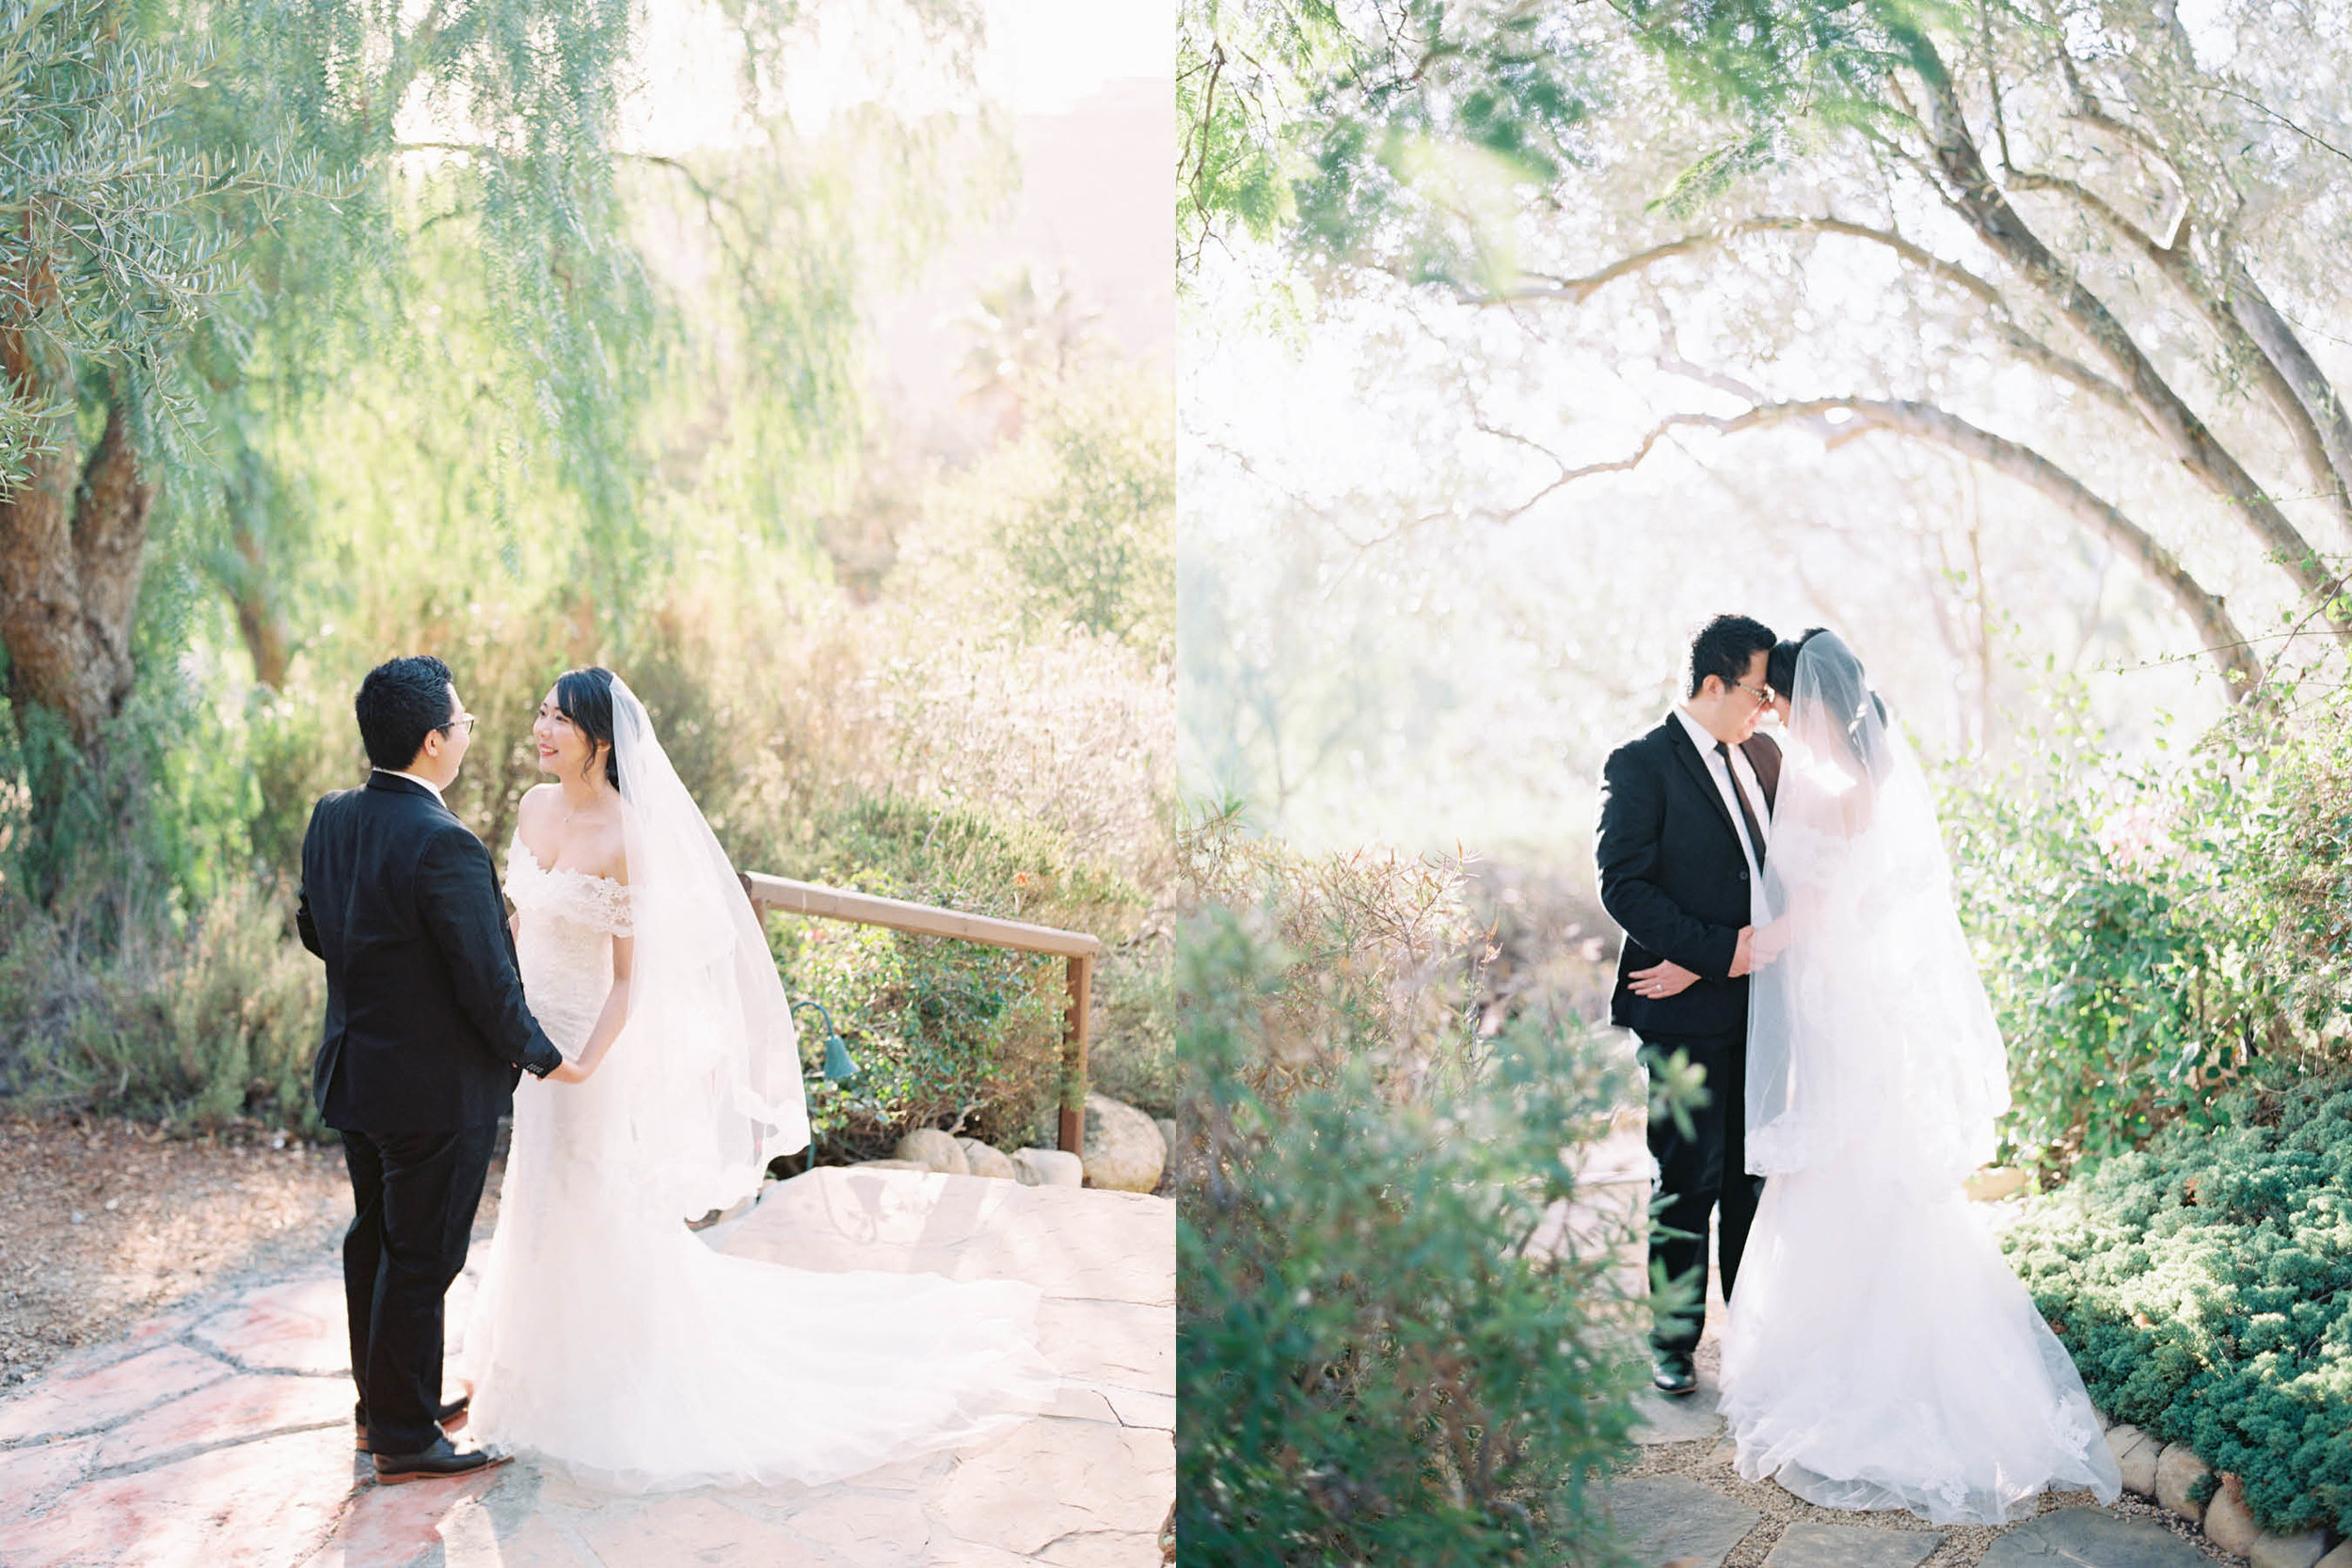 santa-barbara-elopement-wedding-planner-planning-coordinator-coordination-event-design-villa-verano-estate-riviera-garden-olive-tree-asian-day-of-palm-tree (11).jpg